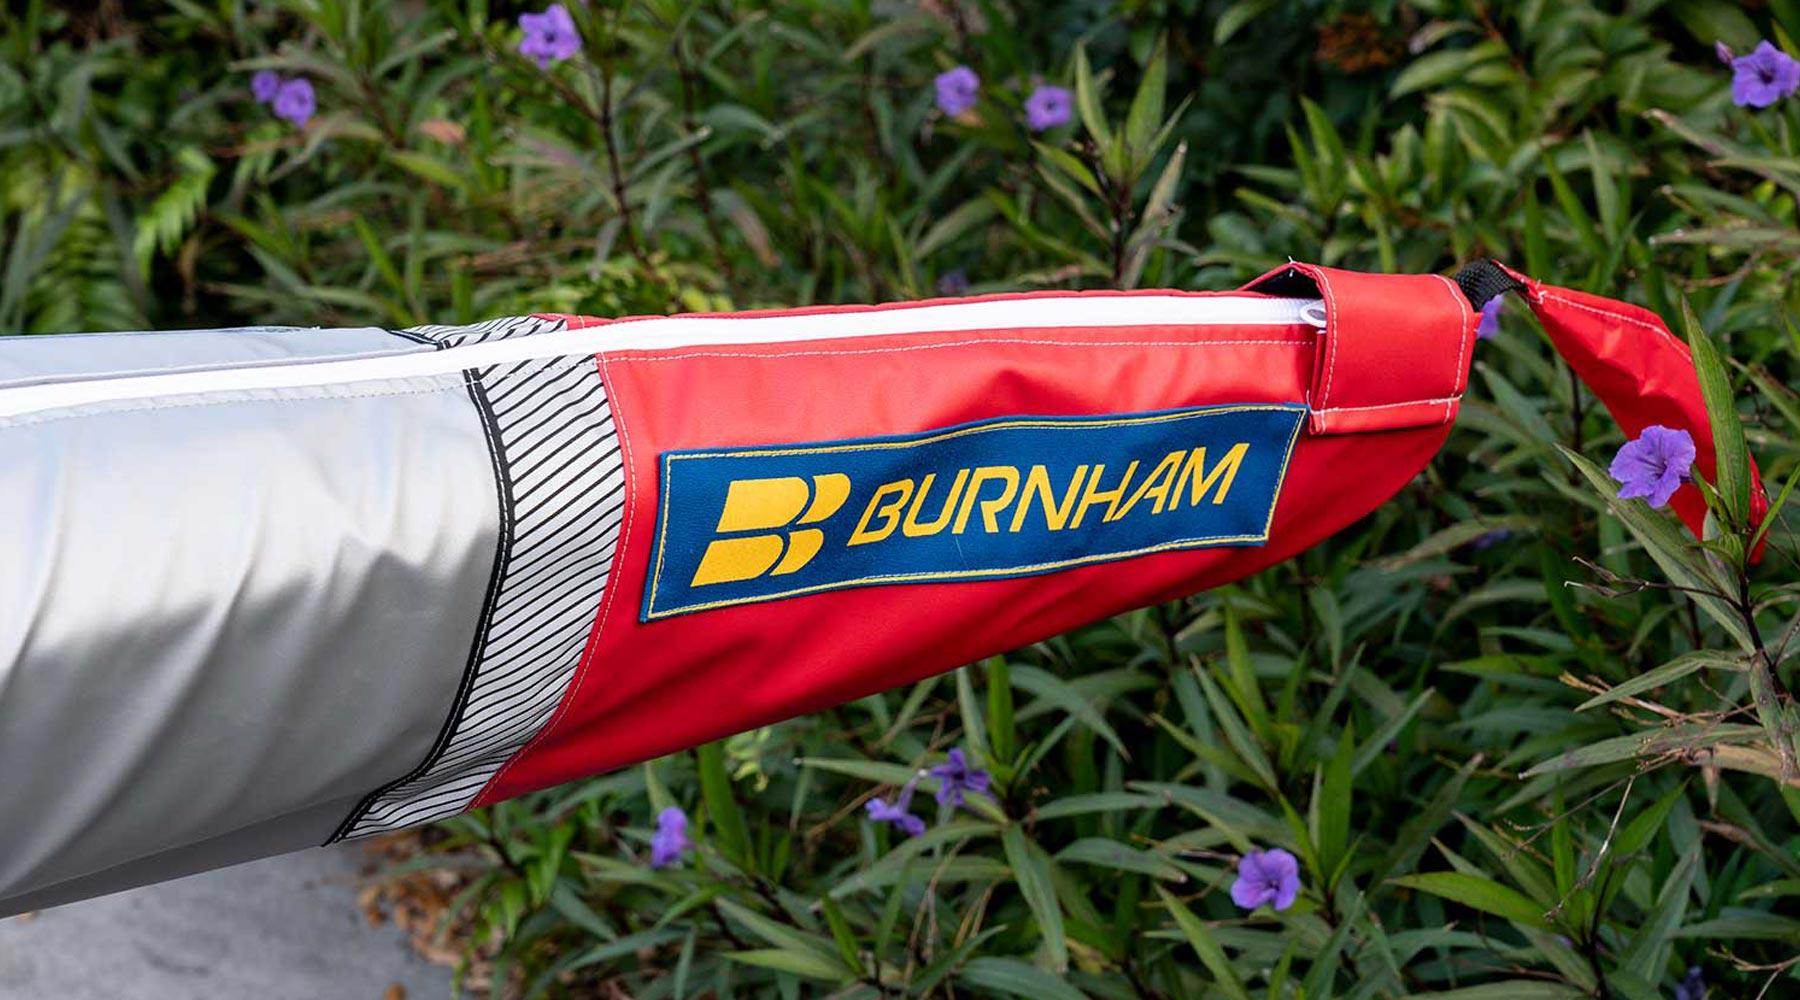 Burnham Boat Bags Five57-Sportswear